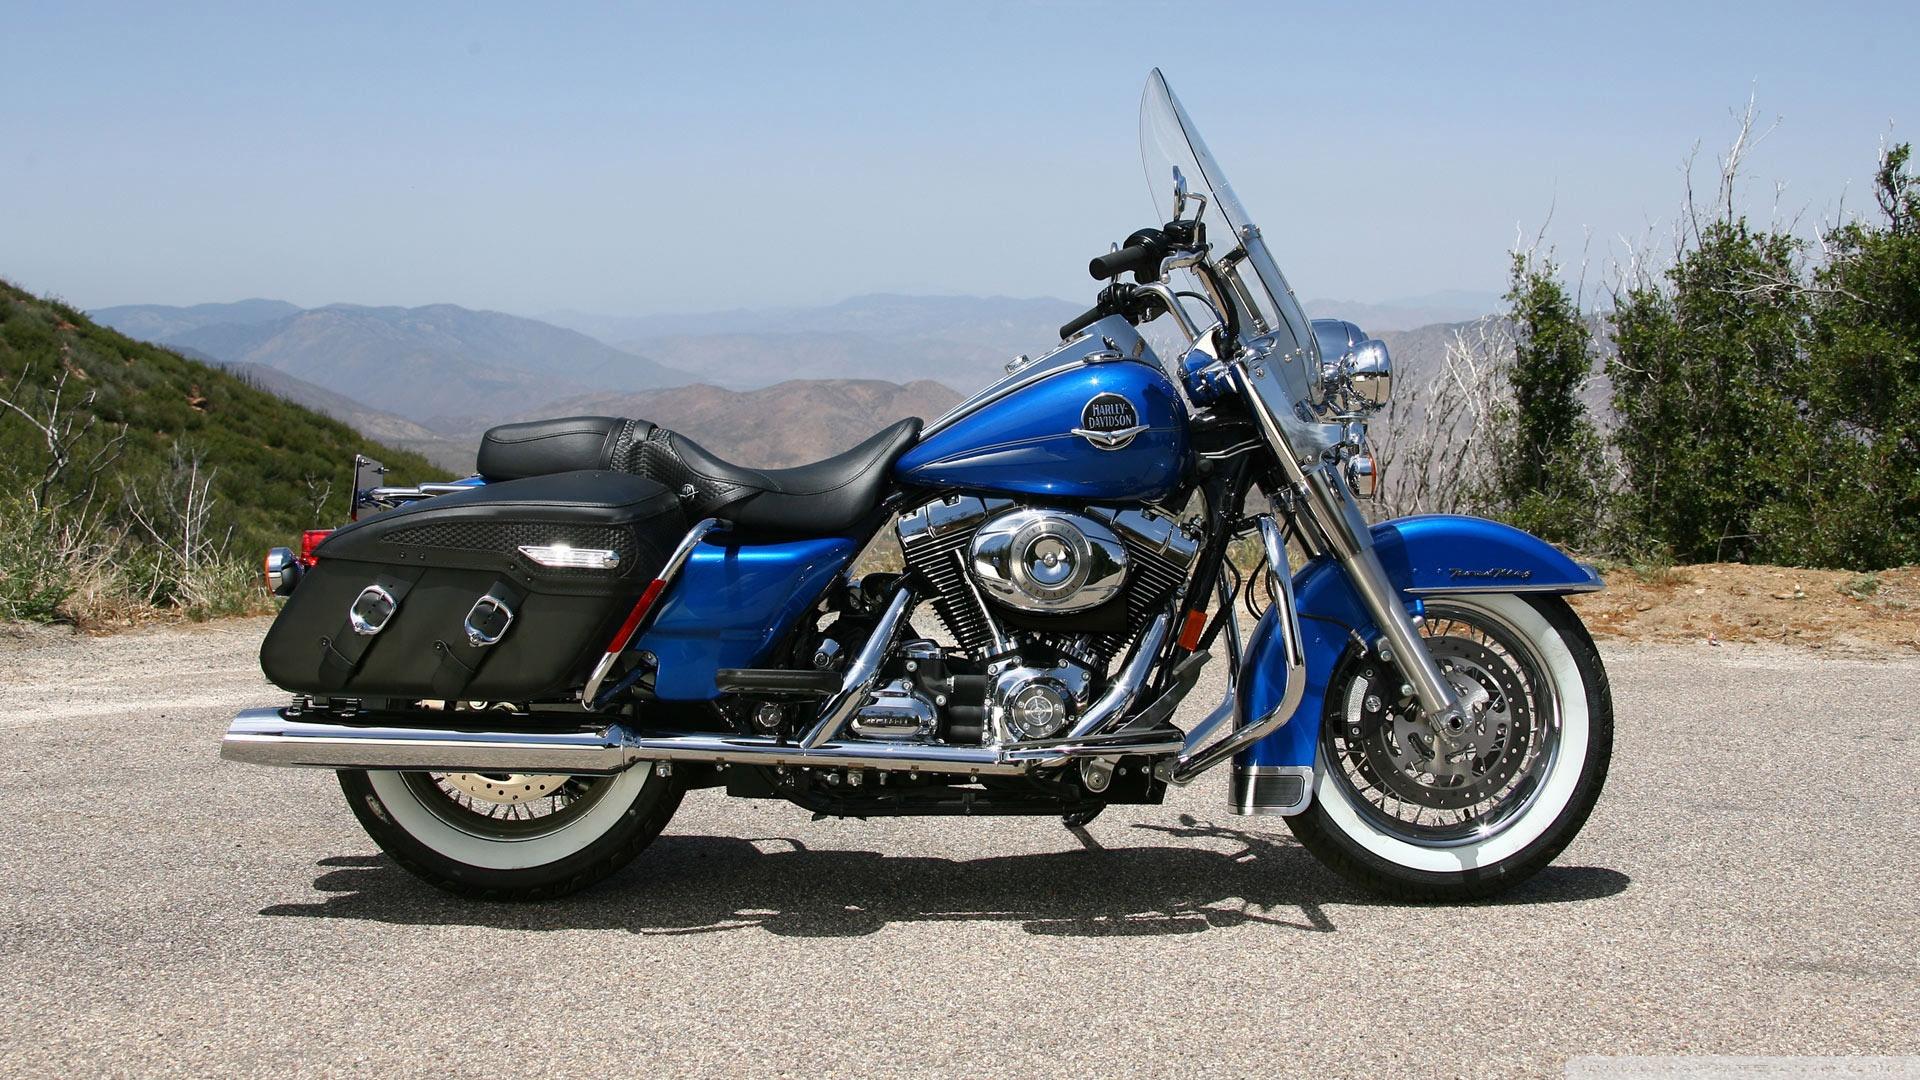 davidson bike harley wallpaper motorcycles bikes 1920x1080